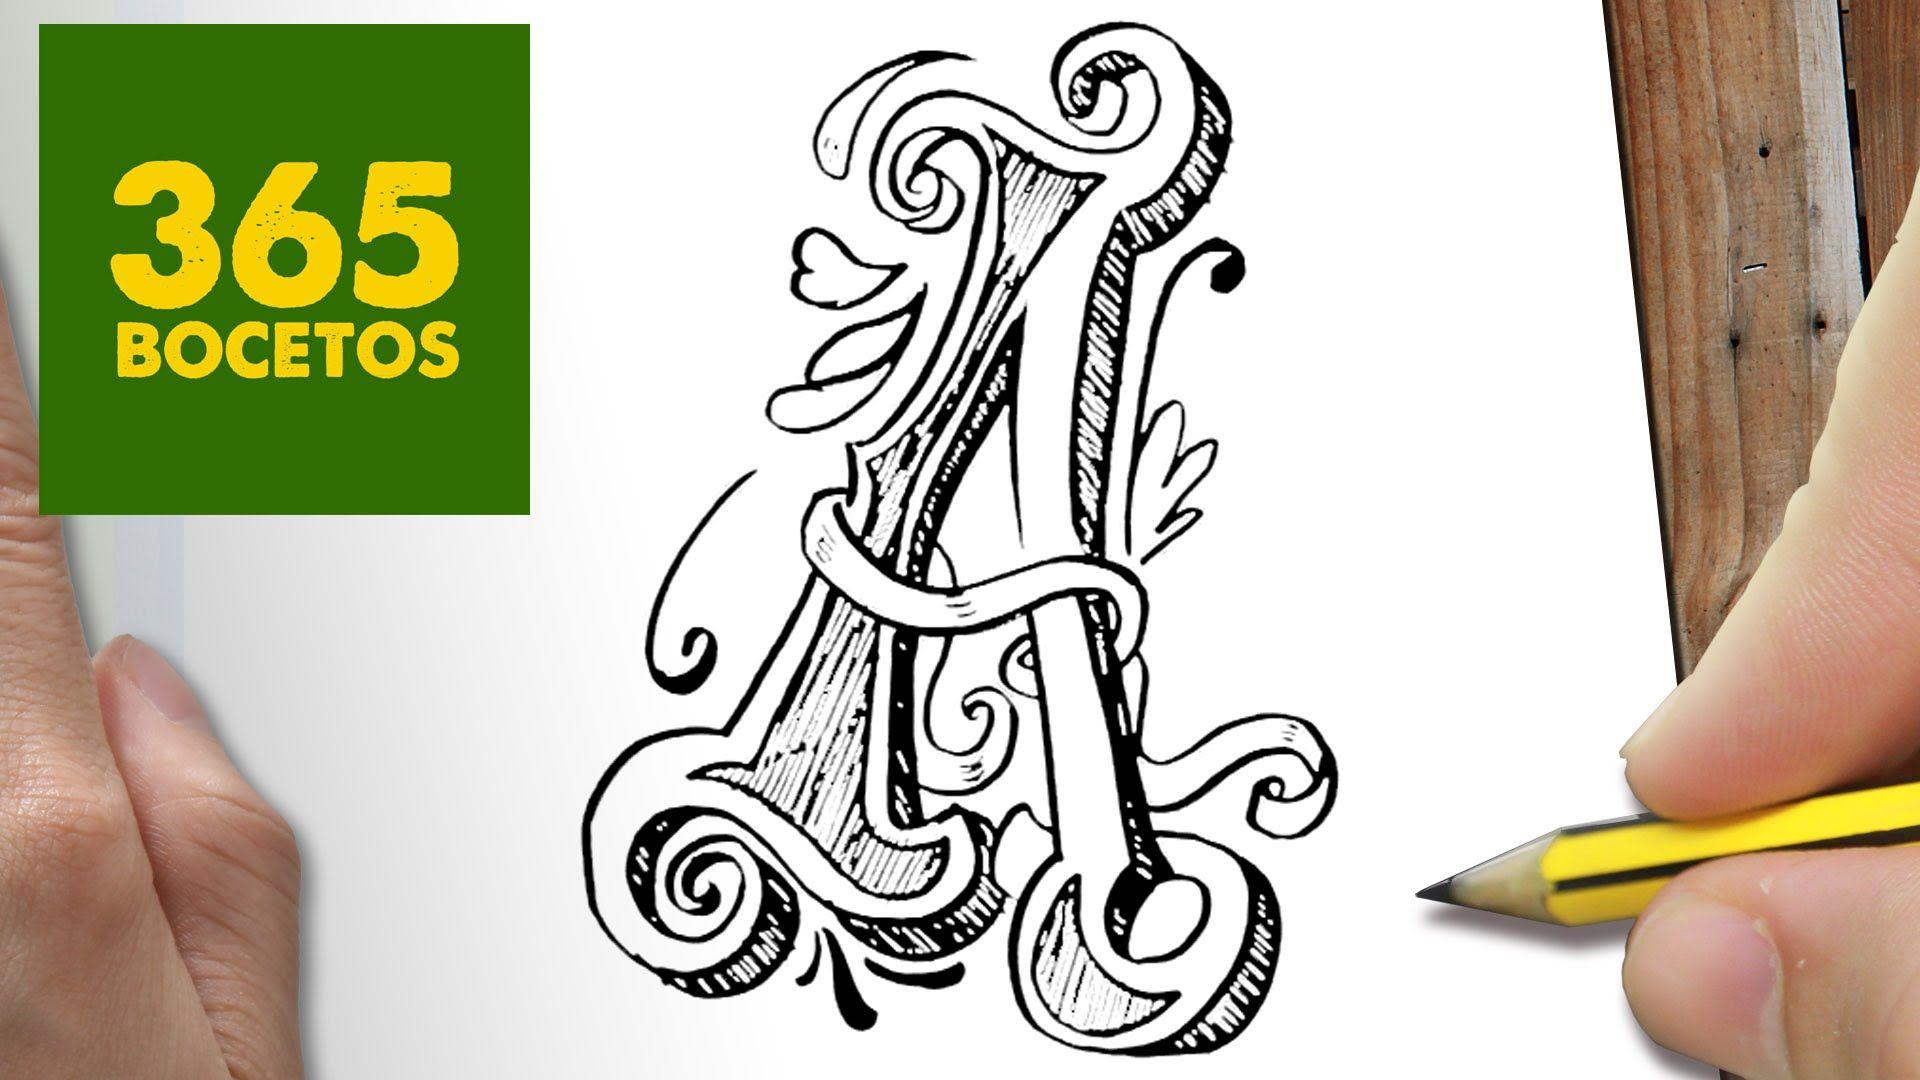 Como Dibujar Letra A Paso A Paso Dibujos Kawaii Faciles How To Draw A Dibujando Letras Dibujos Kawaii Dibujo Paso A Paso